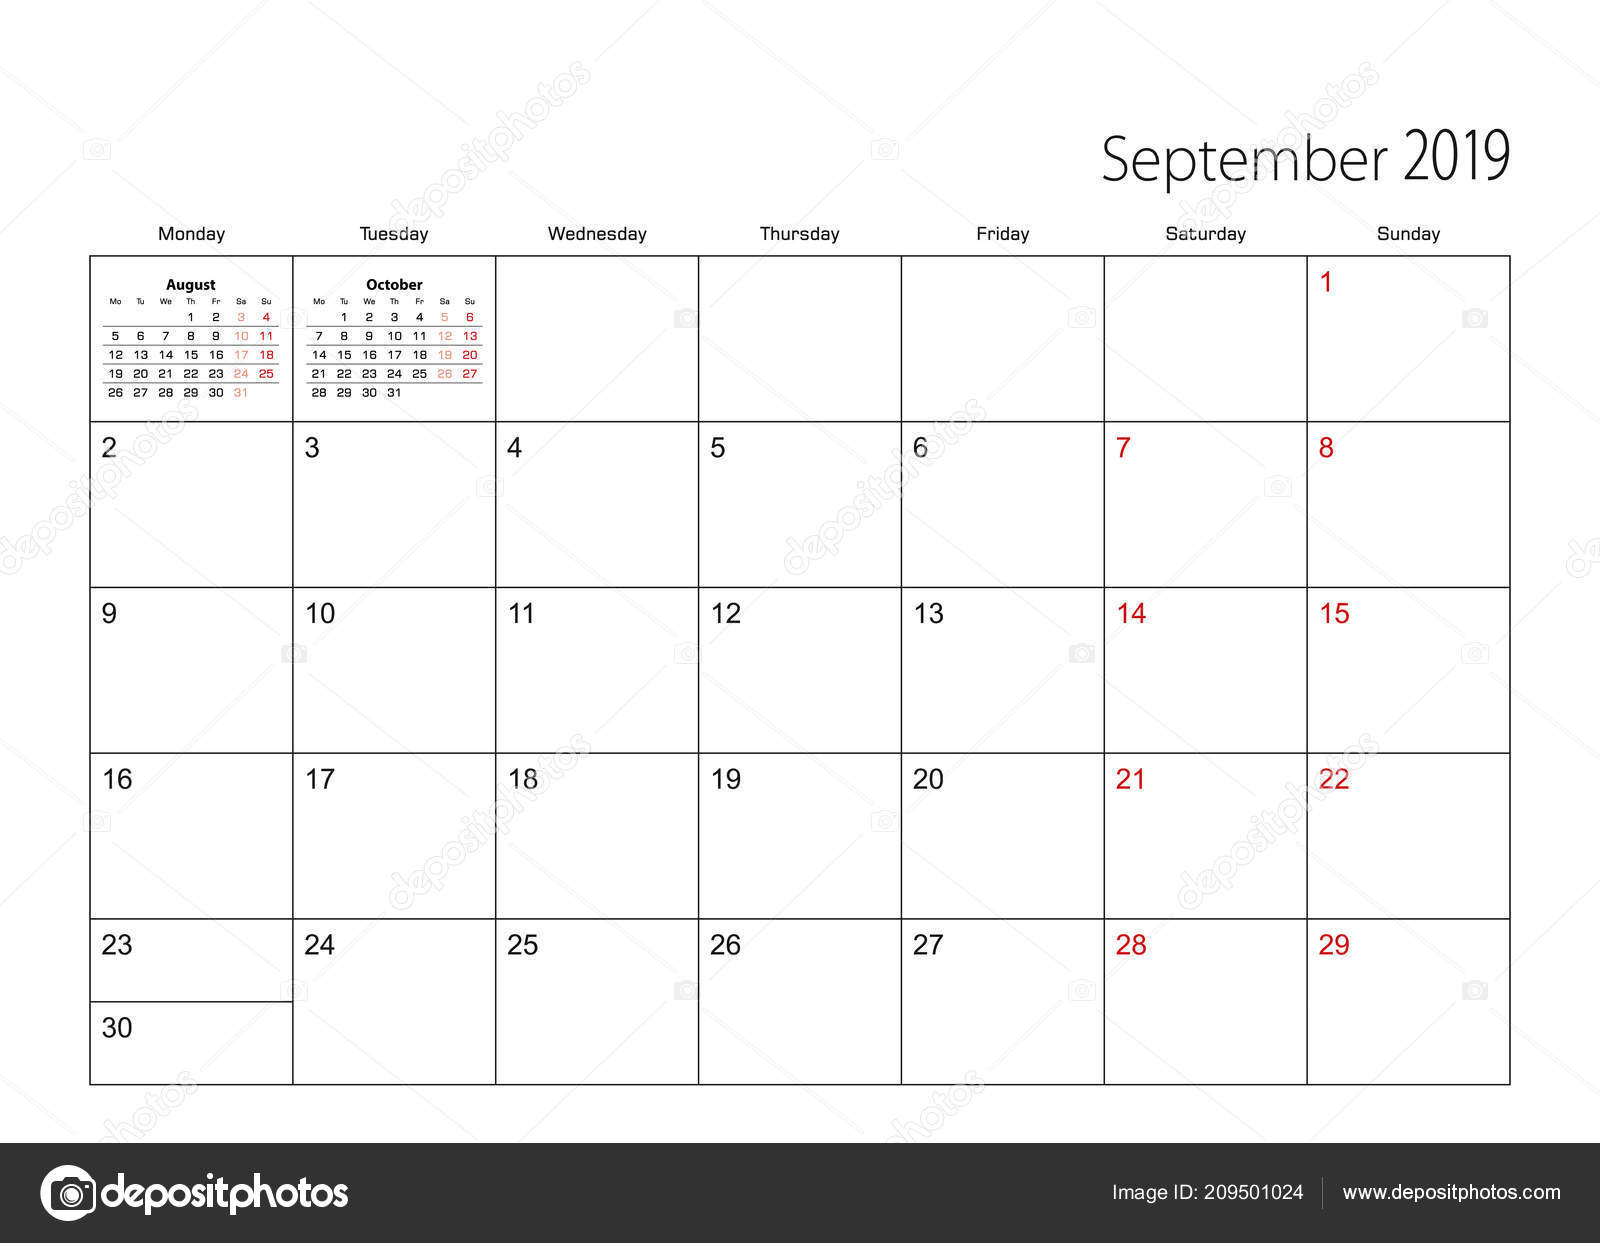 Calendar Planner September 2019.September 2019 Simple Calendar Planner Week Starts Monday Stock